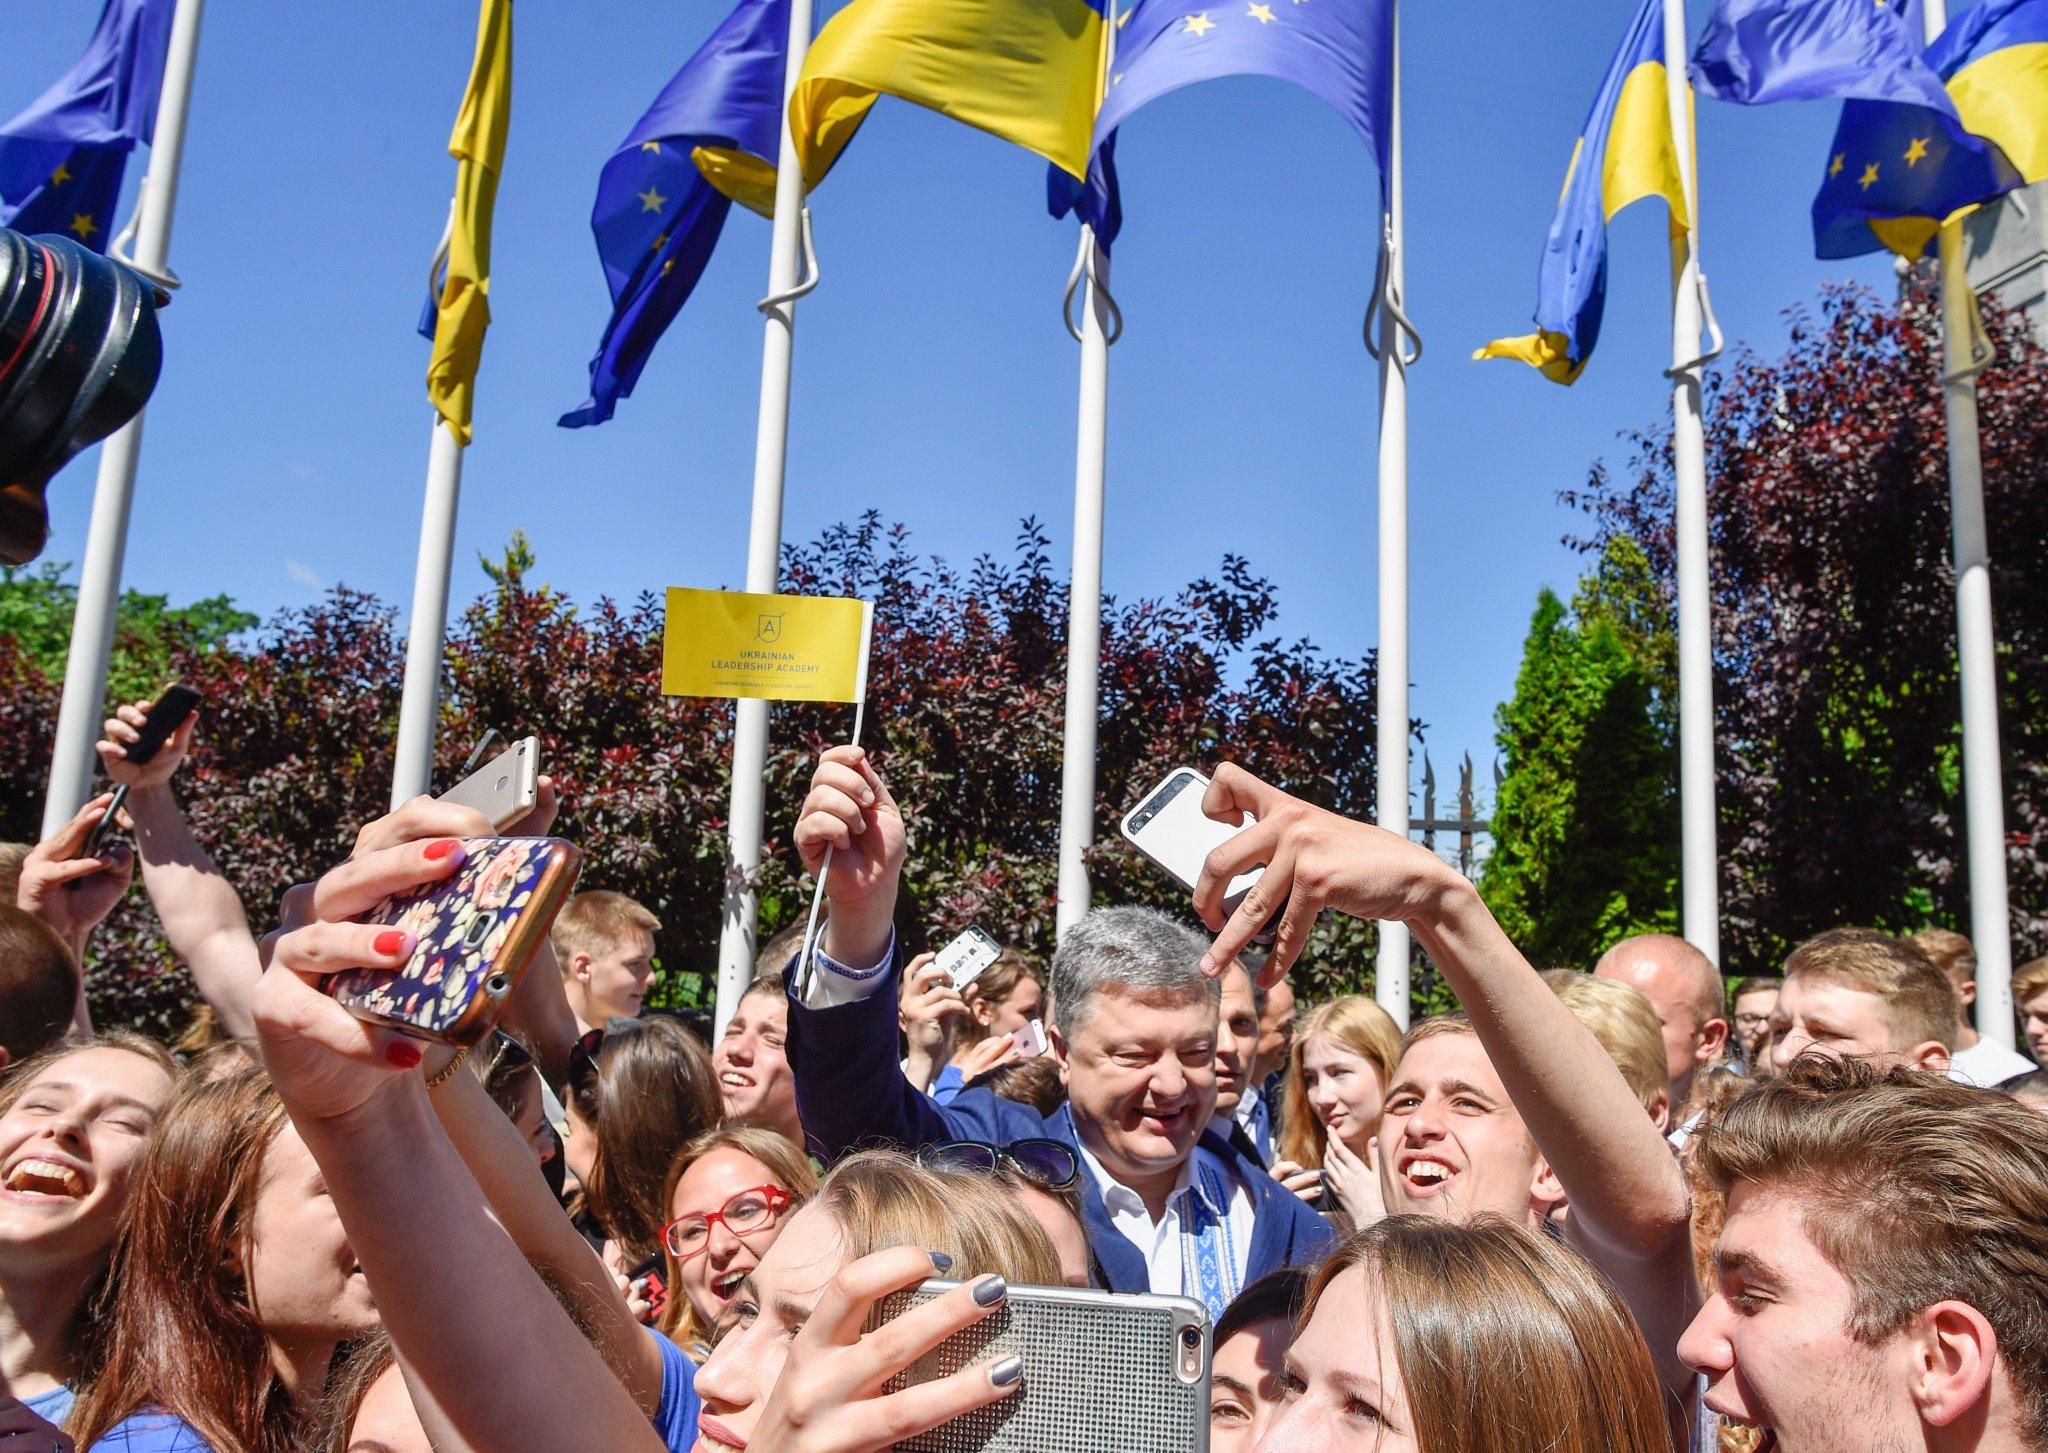 Thumbnail for Перший день #БезВіз у фото / First day of #VisaFree EU travel for Ukraine